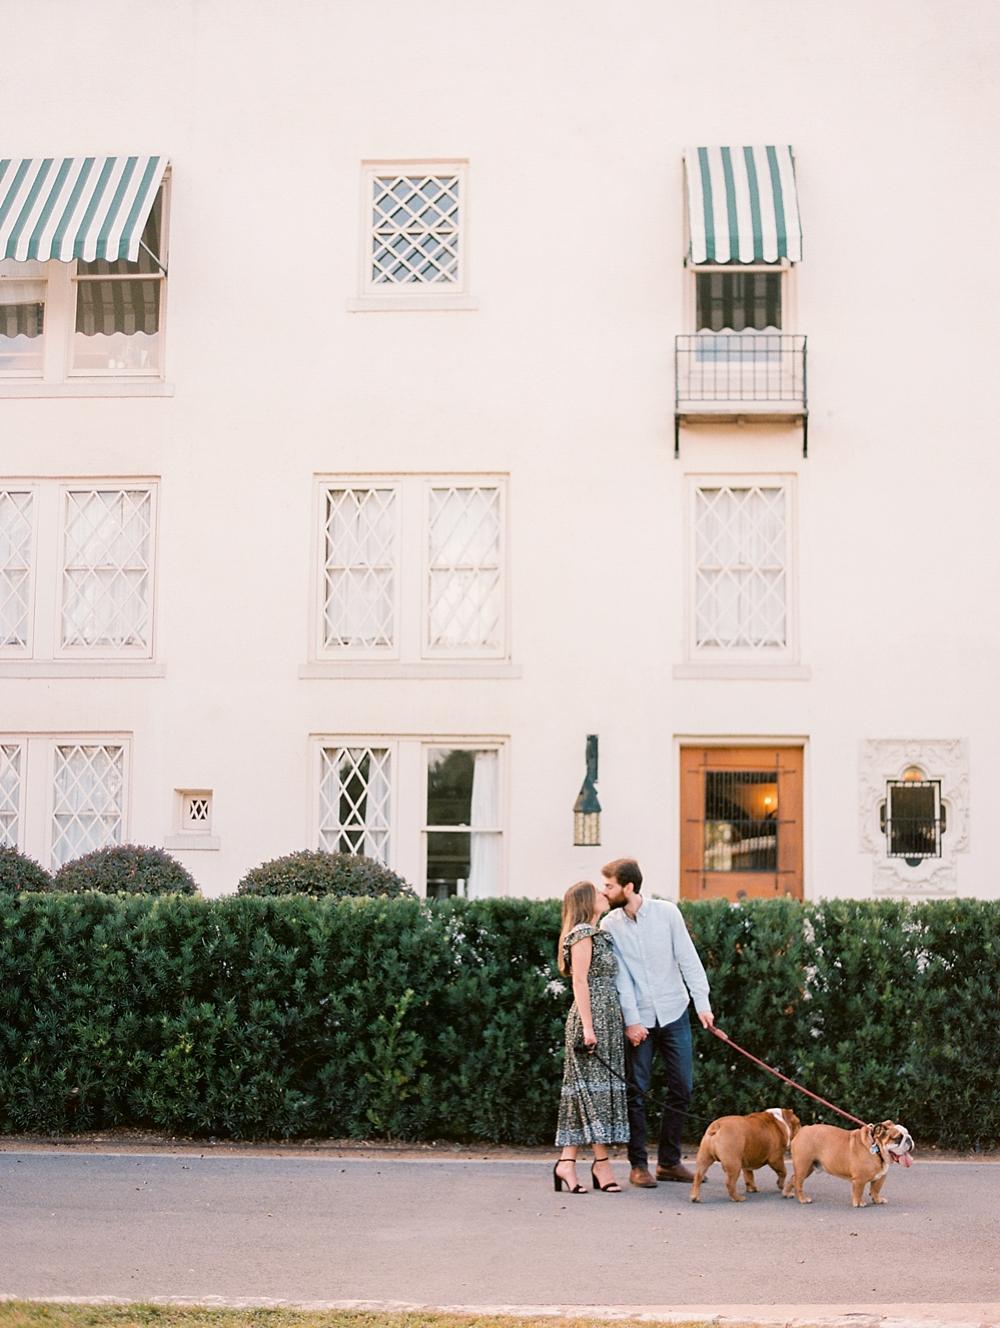 kristin-la-voie-photography-Austin-Wedding-Photographer-laguna-gloria-commodore-perry-estate-engagement-47